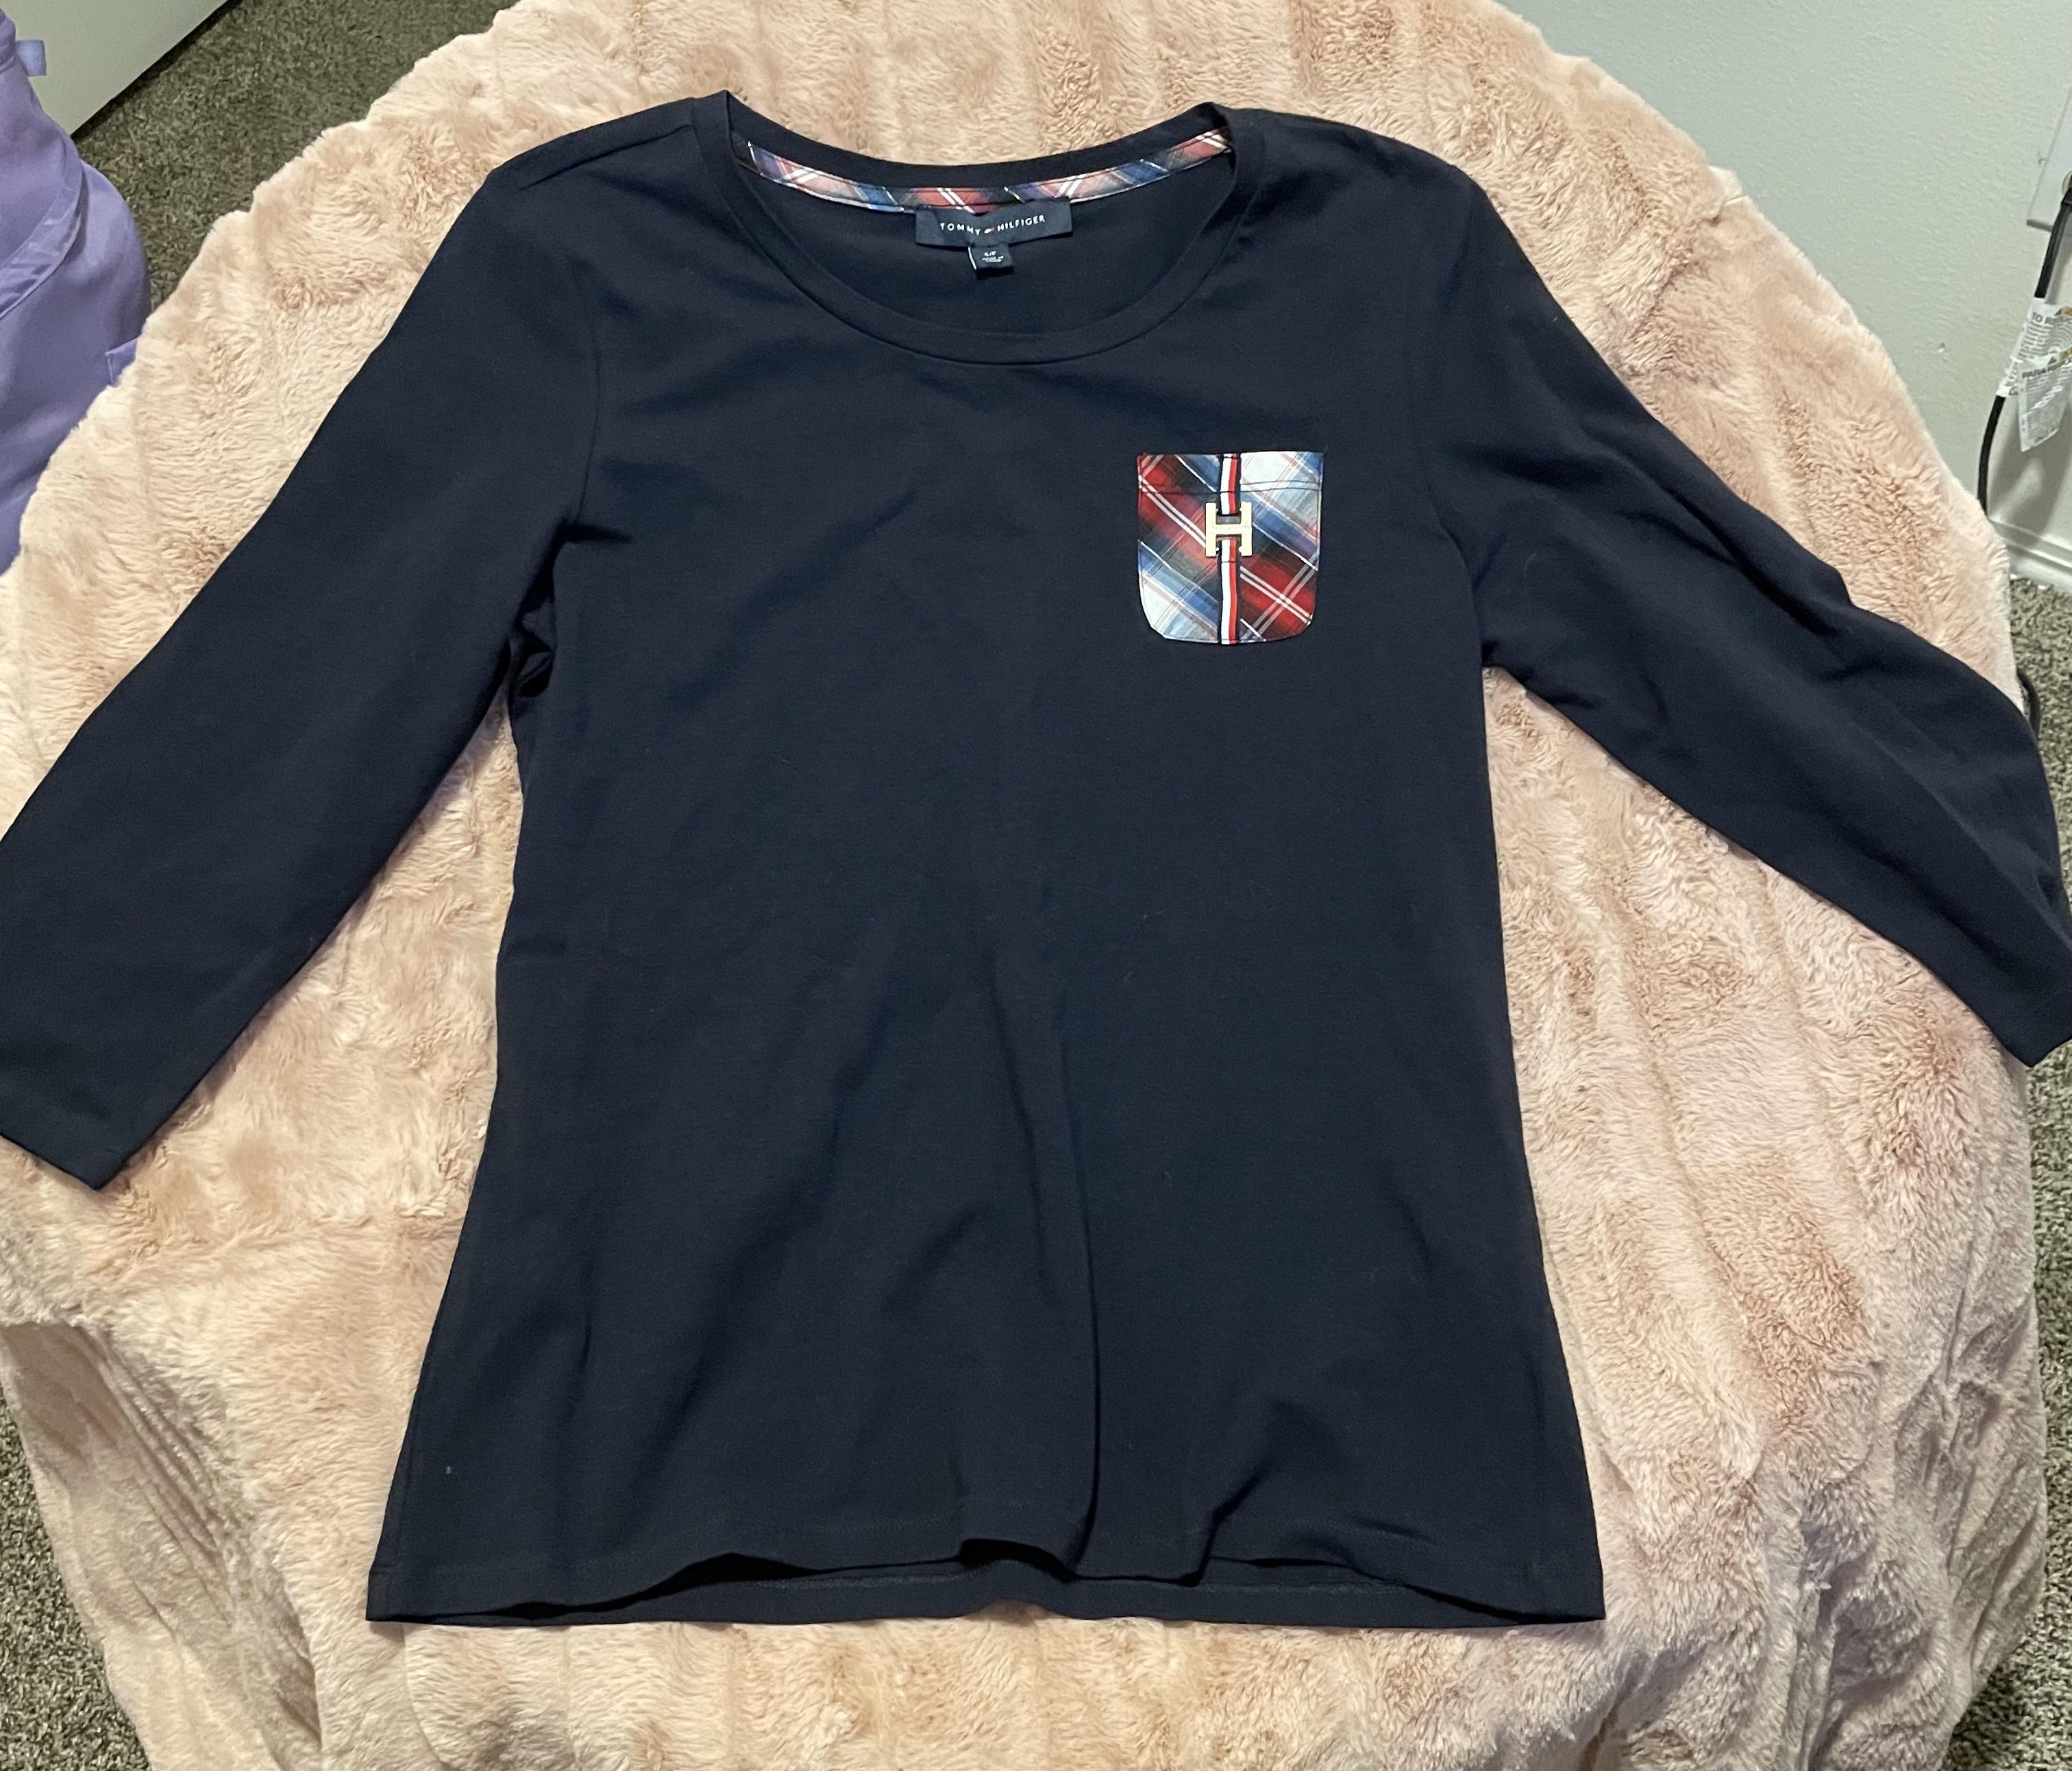 Tommy Hilfiger 3/4 Length Sleeves   Plaid Pattern   H Emblem   Women's Small Shirt